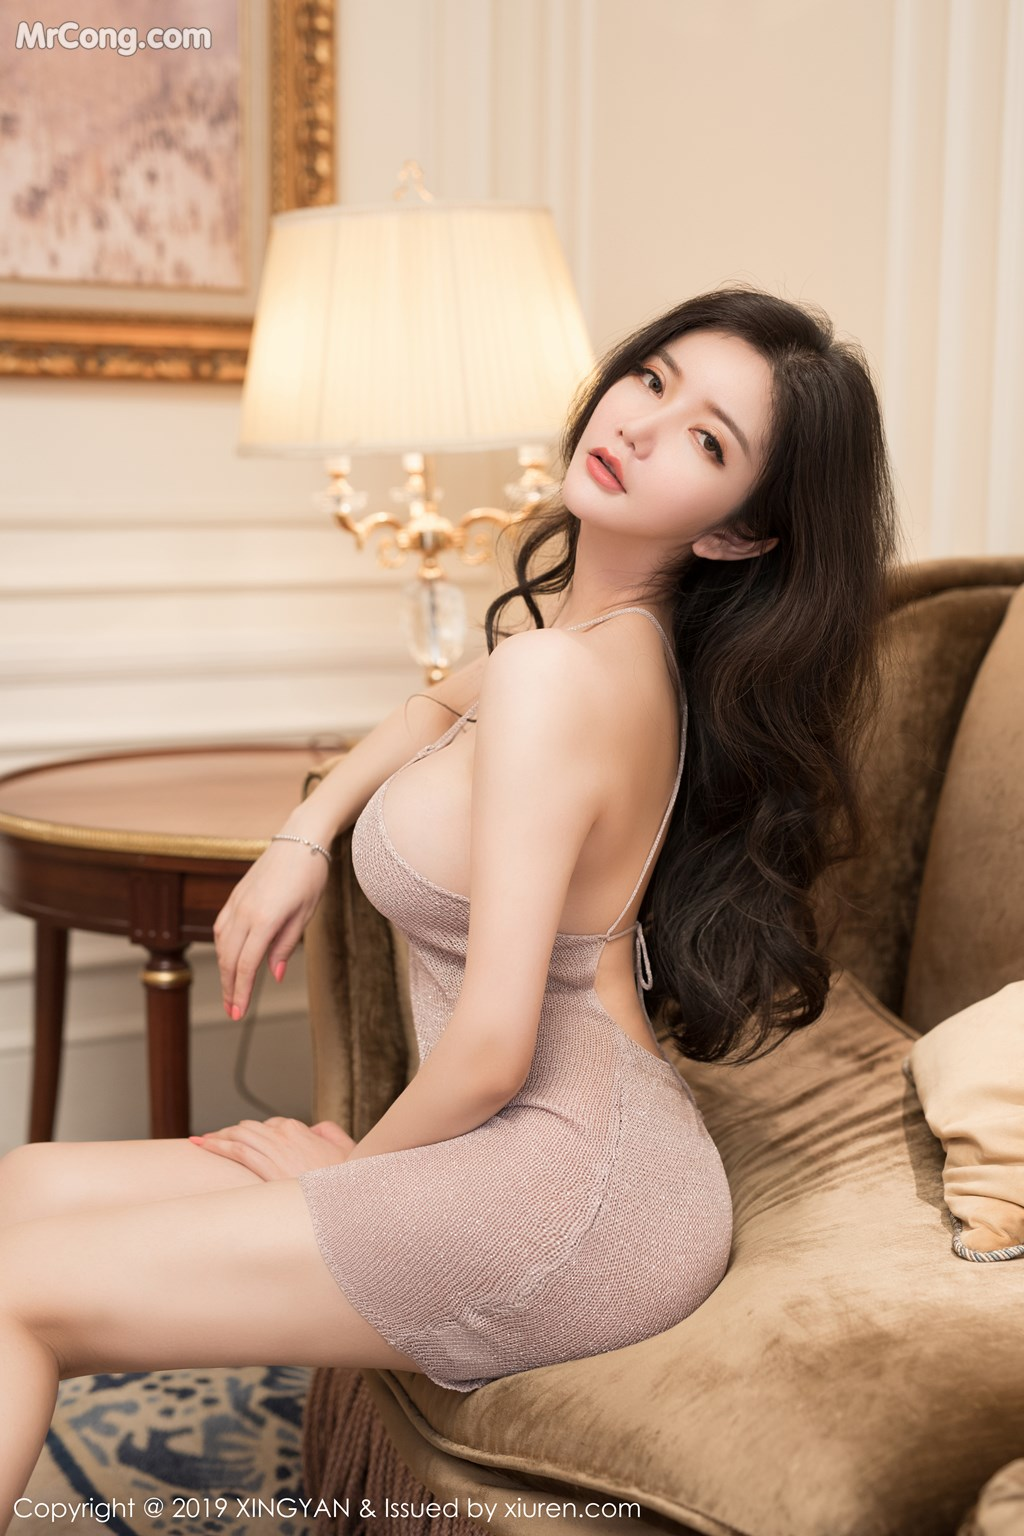 Image XingYan-Vol.122-MrCong.com-007 in post XingYan Vol.122: 心妍小公主 (47 ảnh)